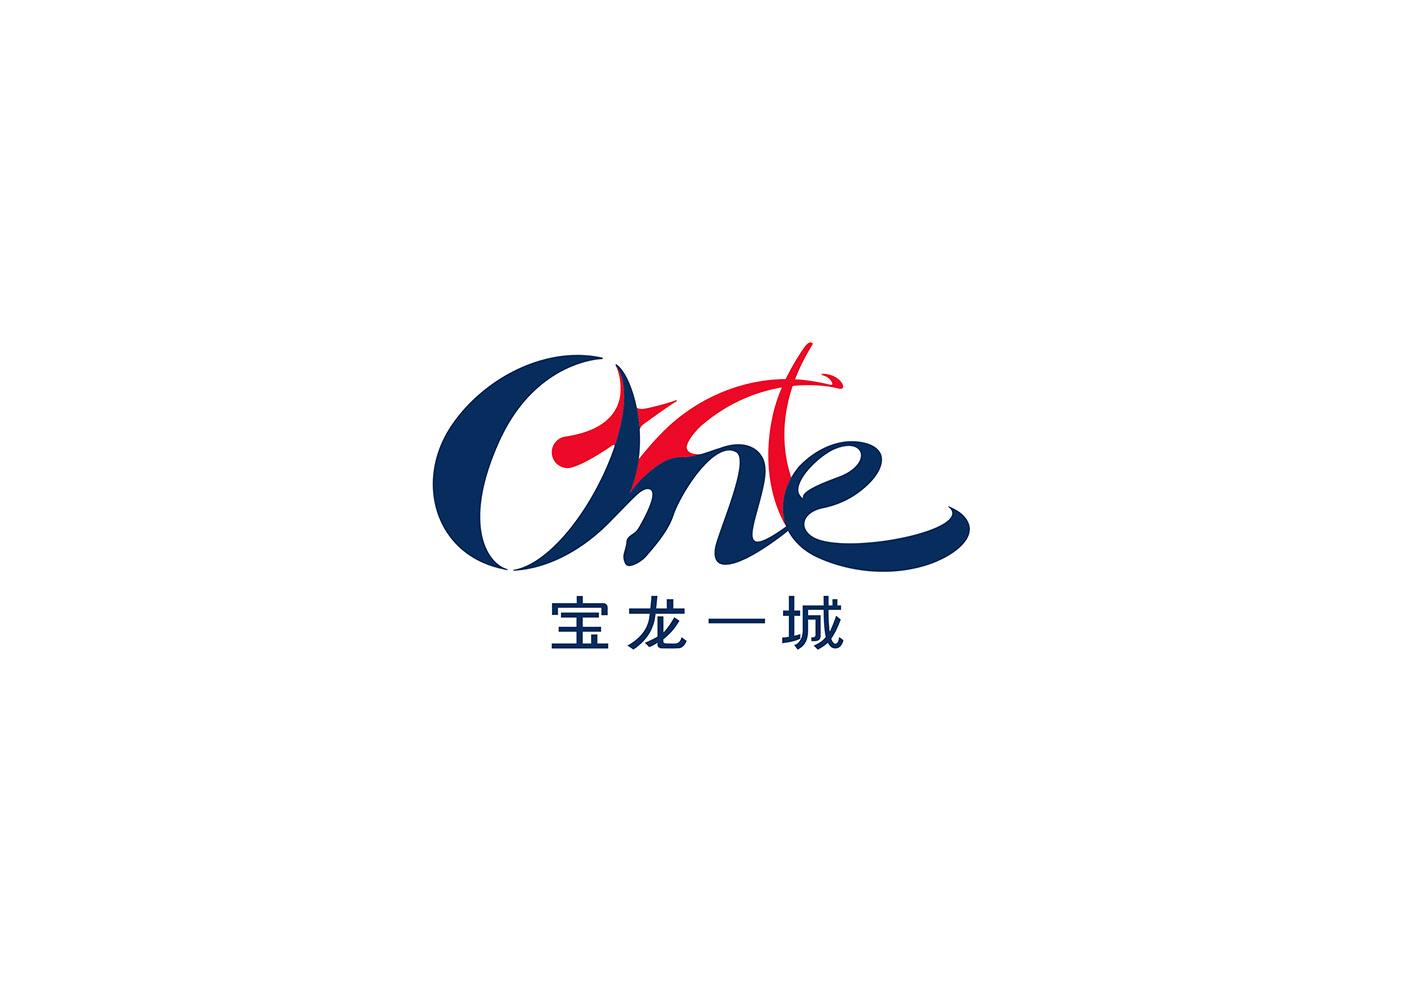 One Mall 宝龙一城厦门 visual identity design